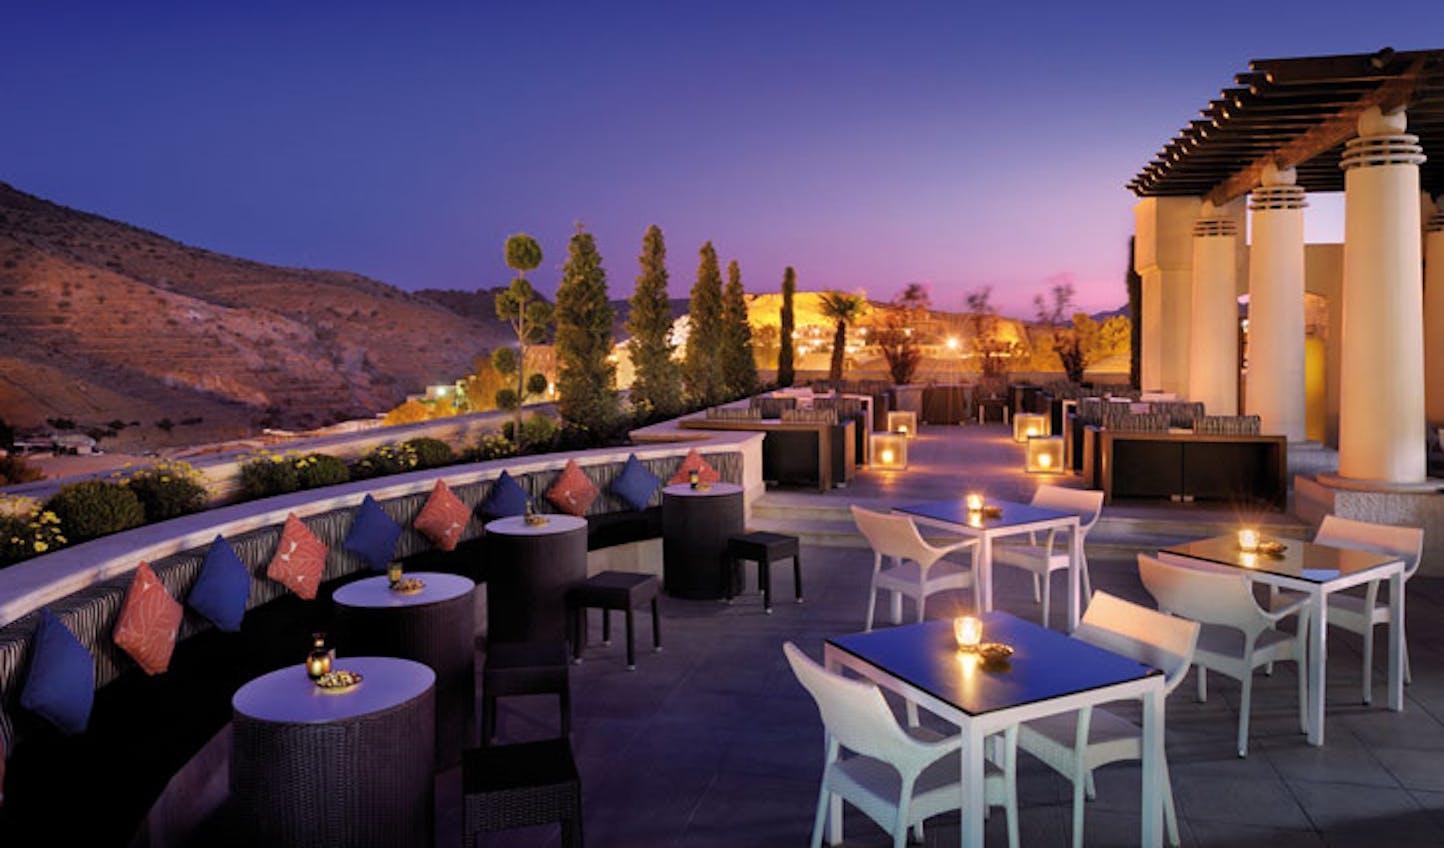 Stay at the Mövenpick Petra Resort